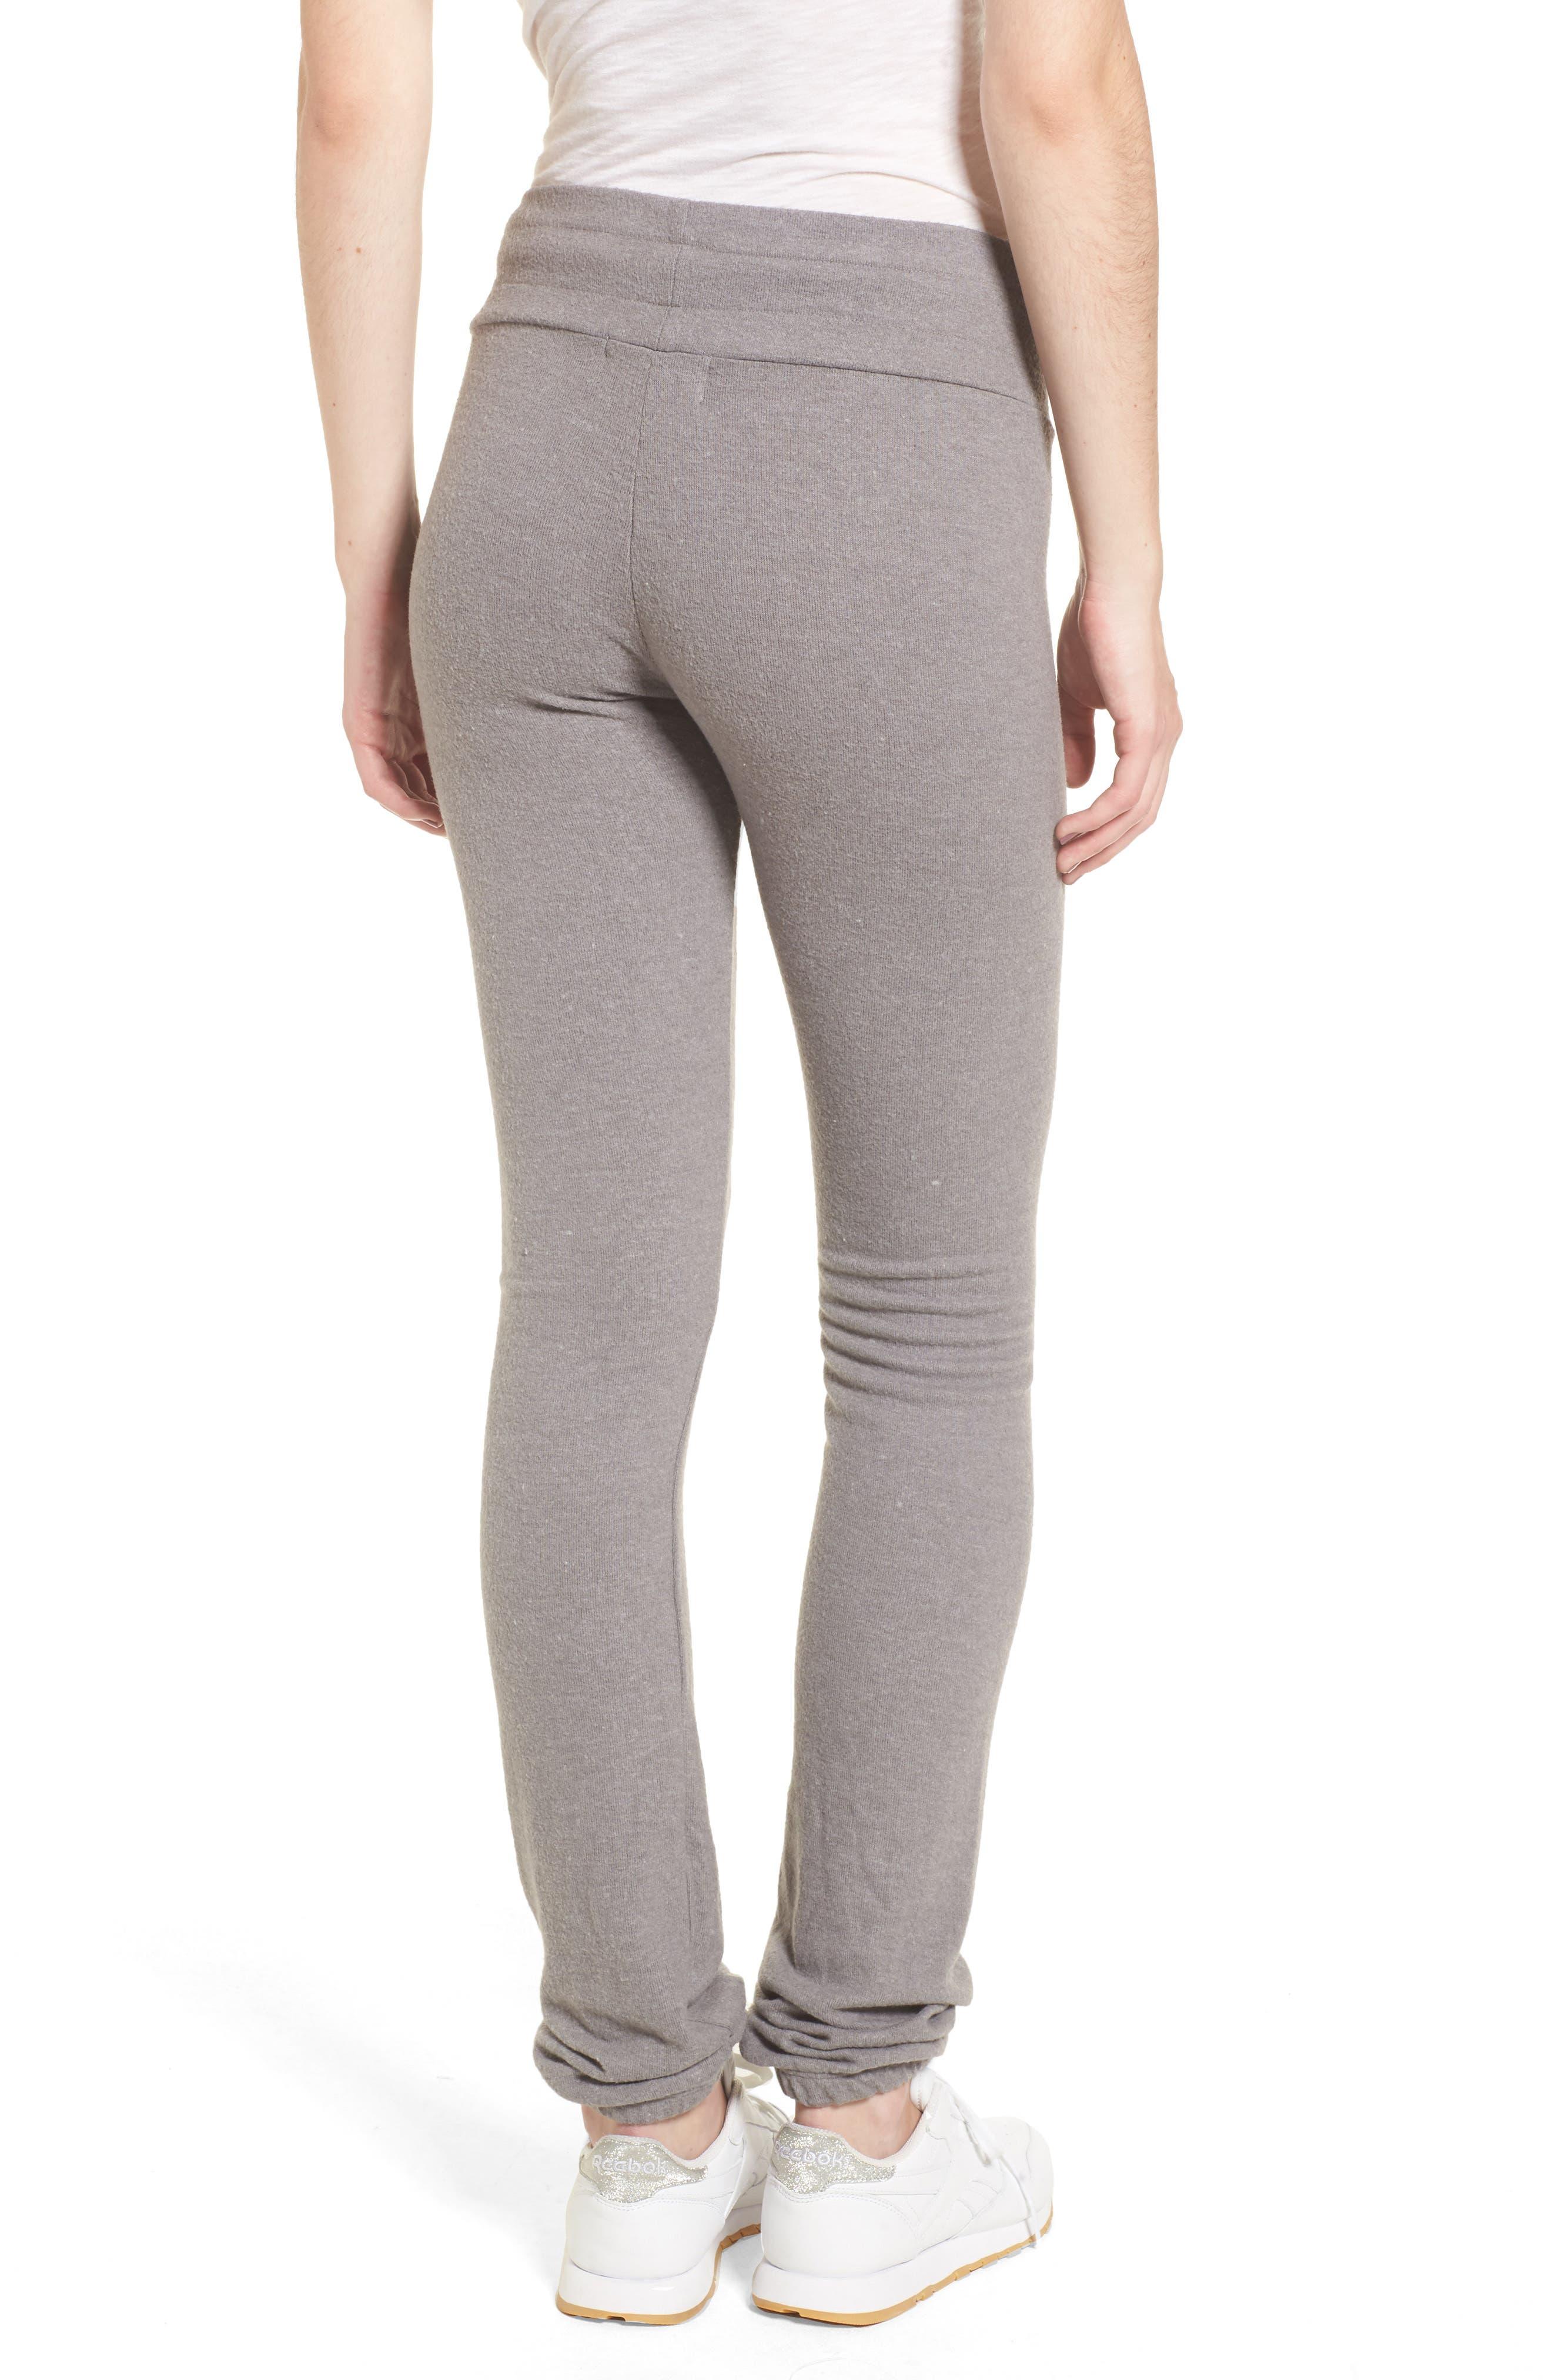 NYC Sweatpants,                             Alternate thumbnail 2, color,                             Vintage Grey